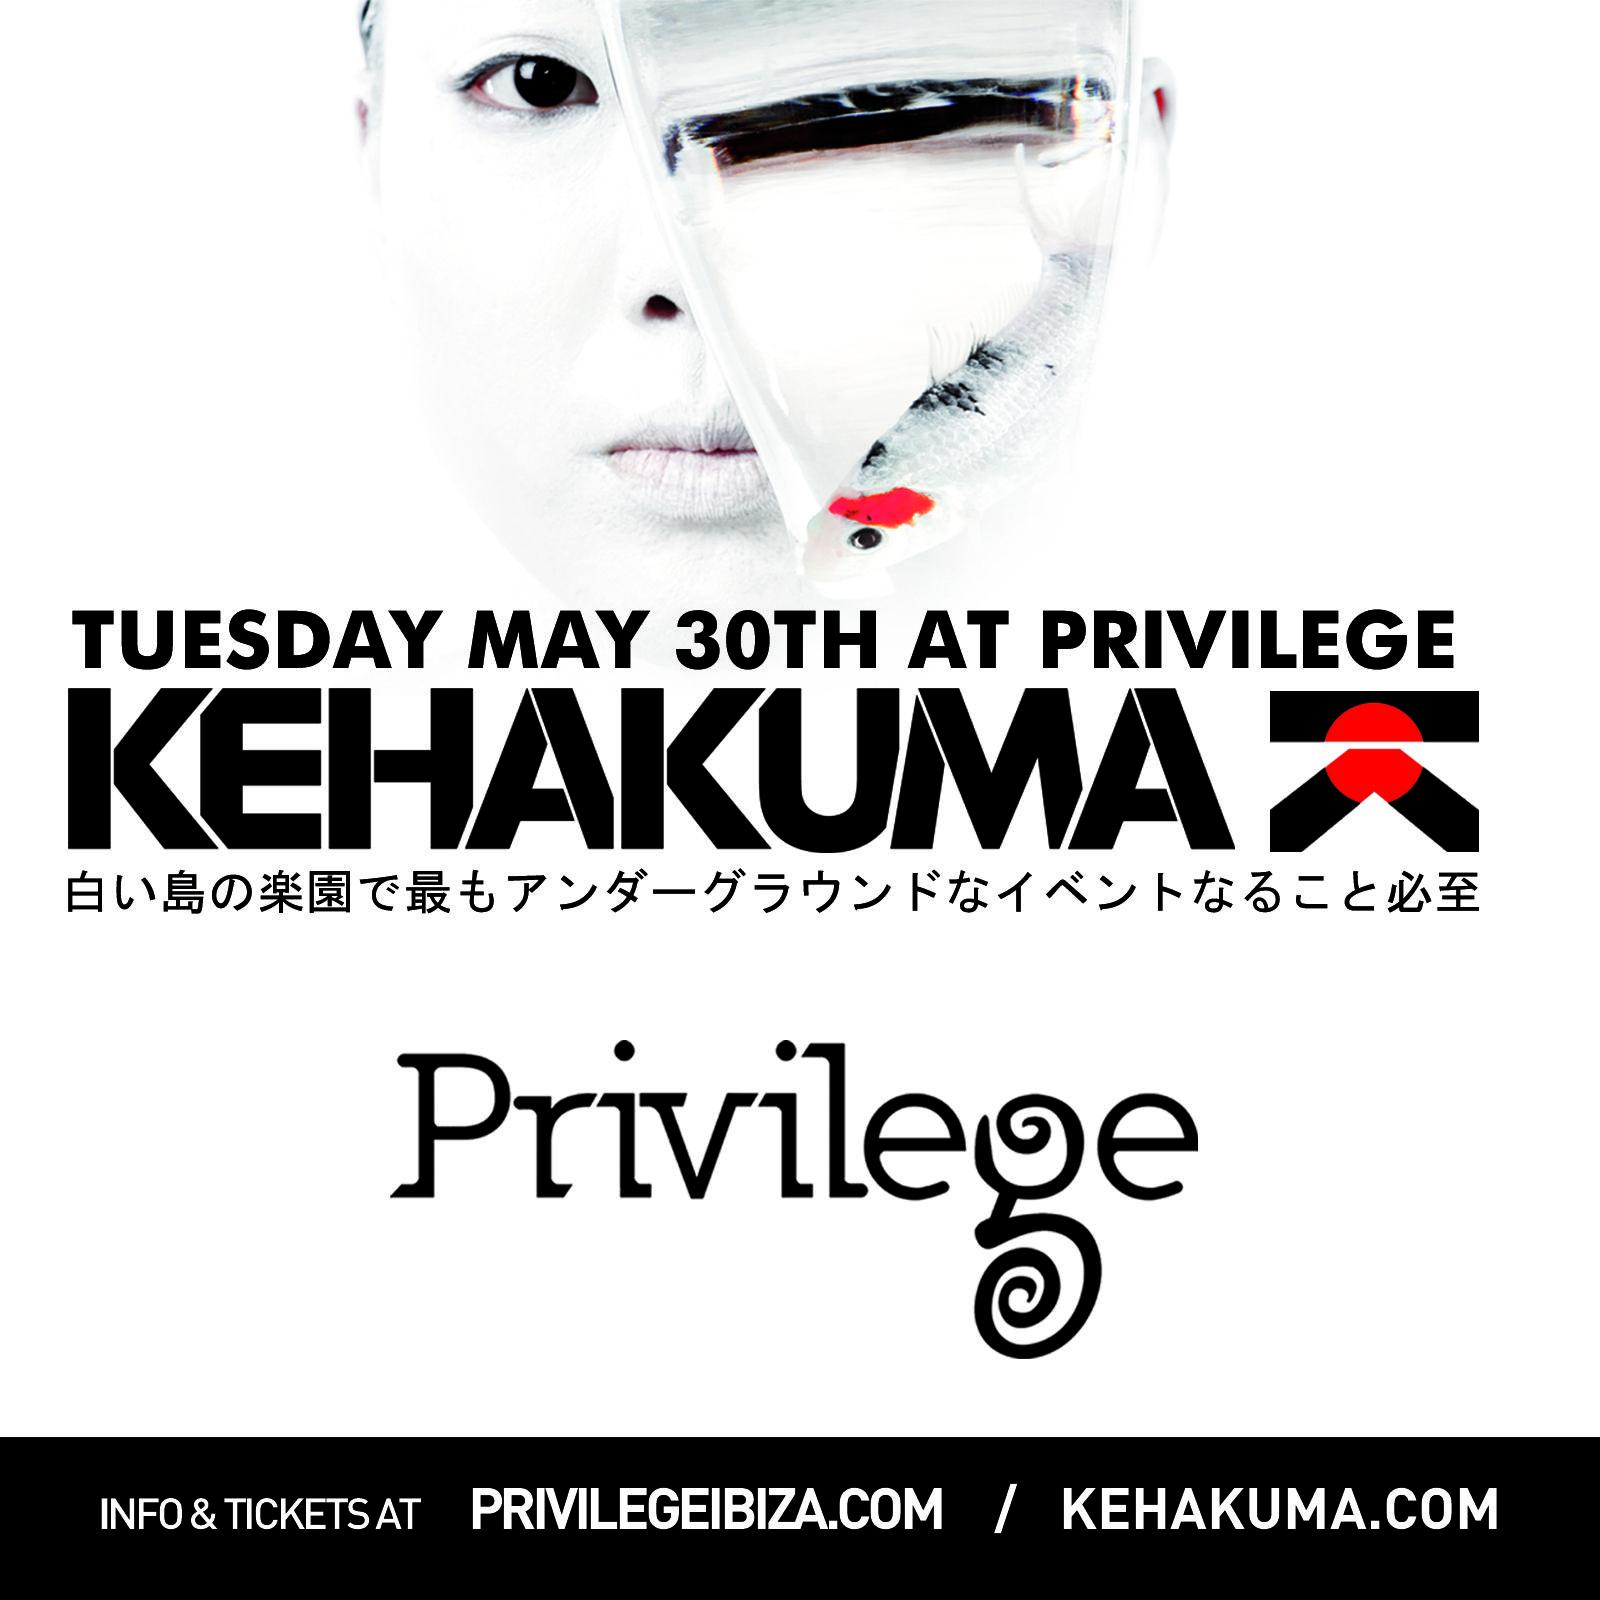 2017-05-30_kehakuma_privilege_1600x1600.jpg